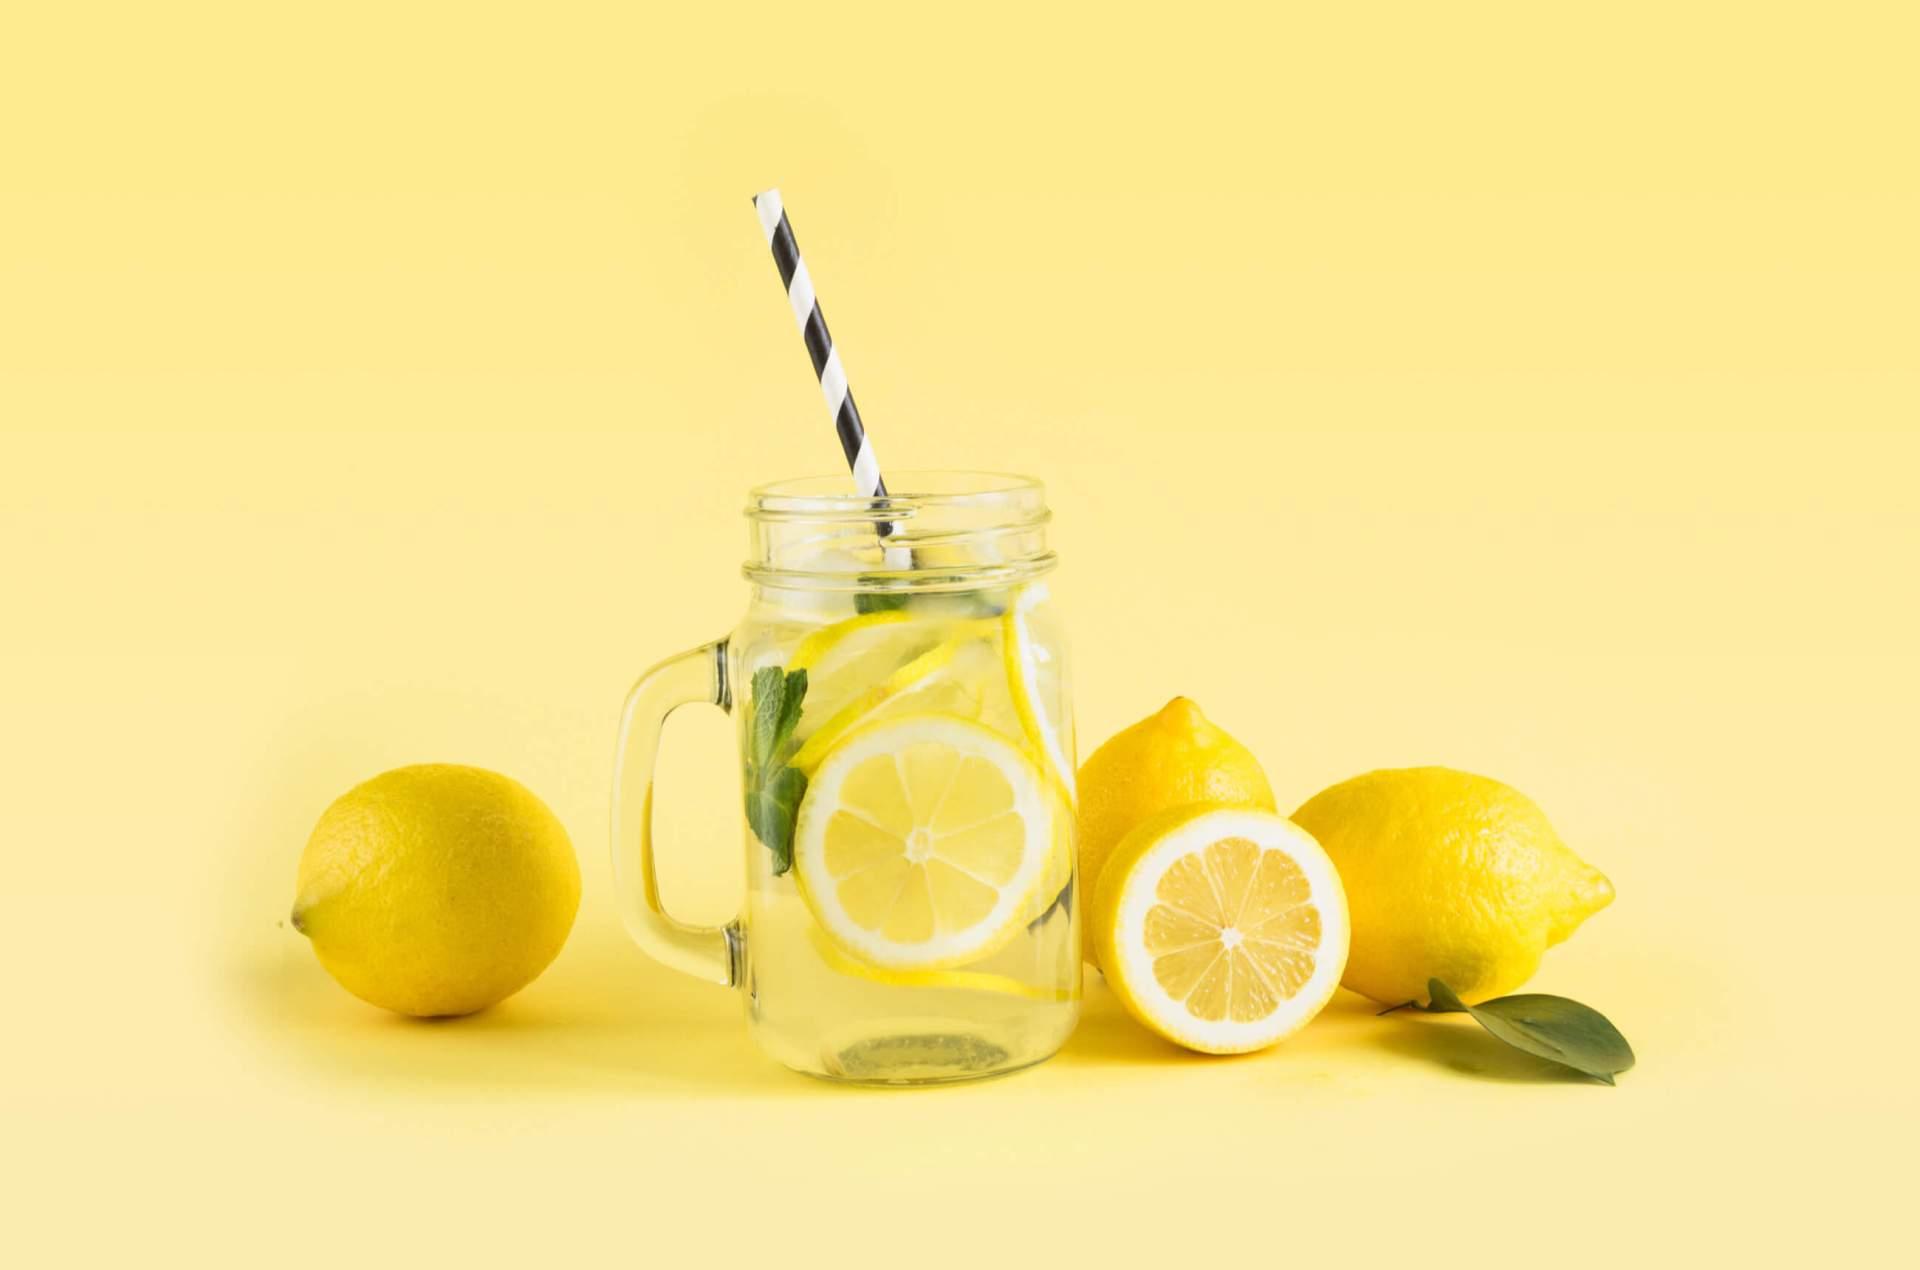 Lemonade from a lemonade stand